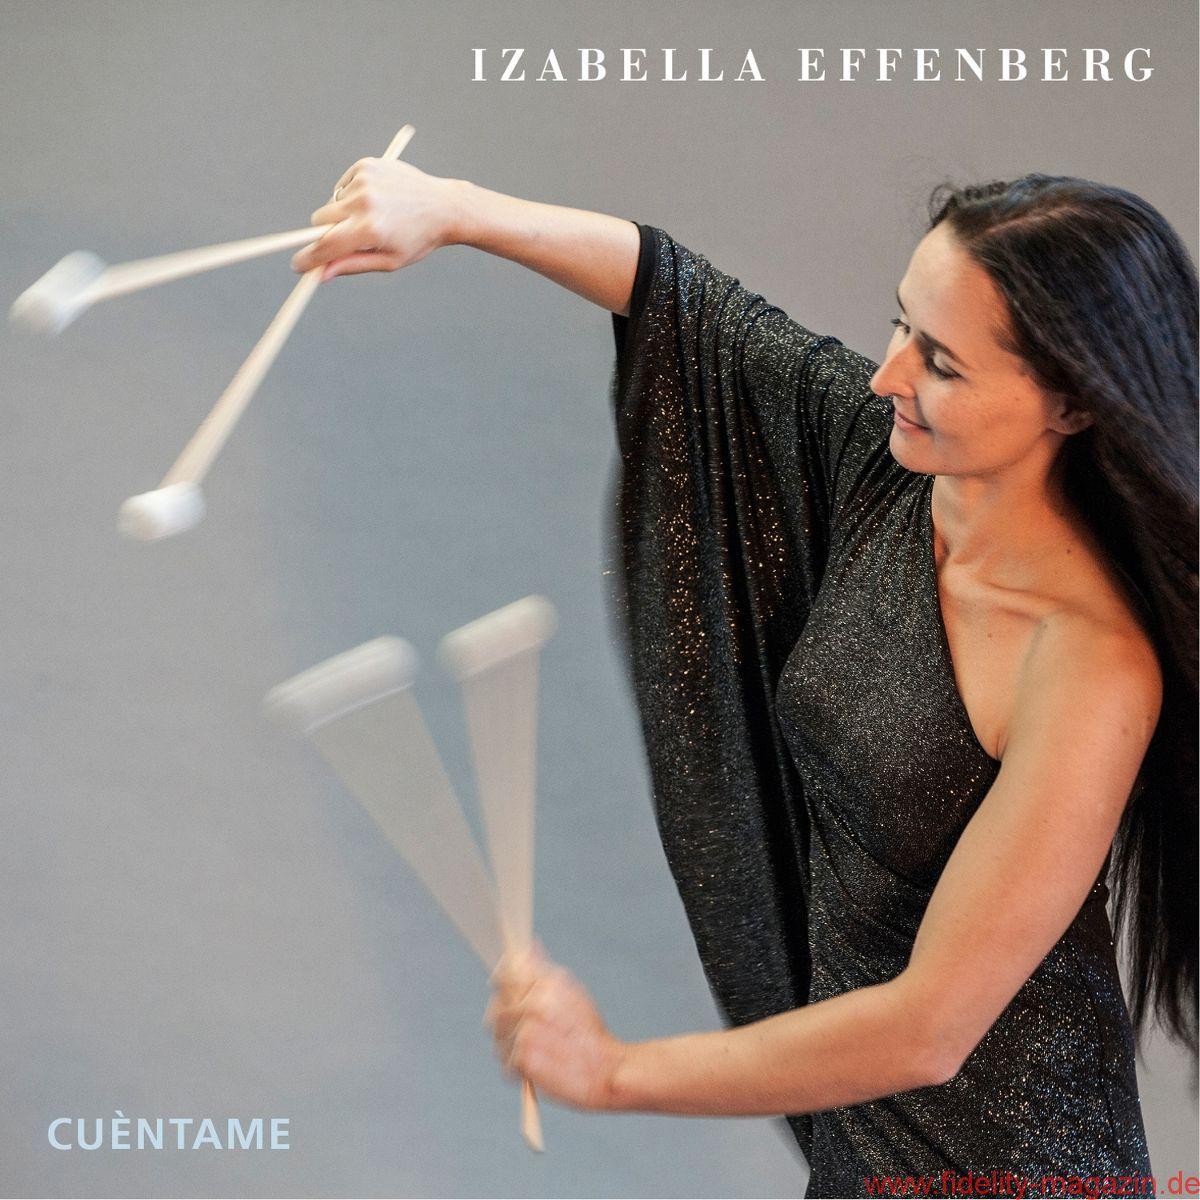 Izabella Effenberg – Cuéntame